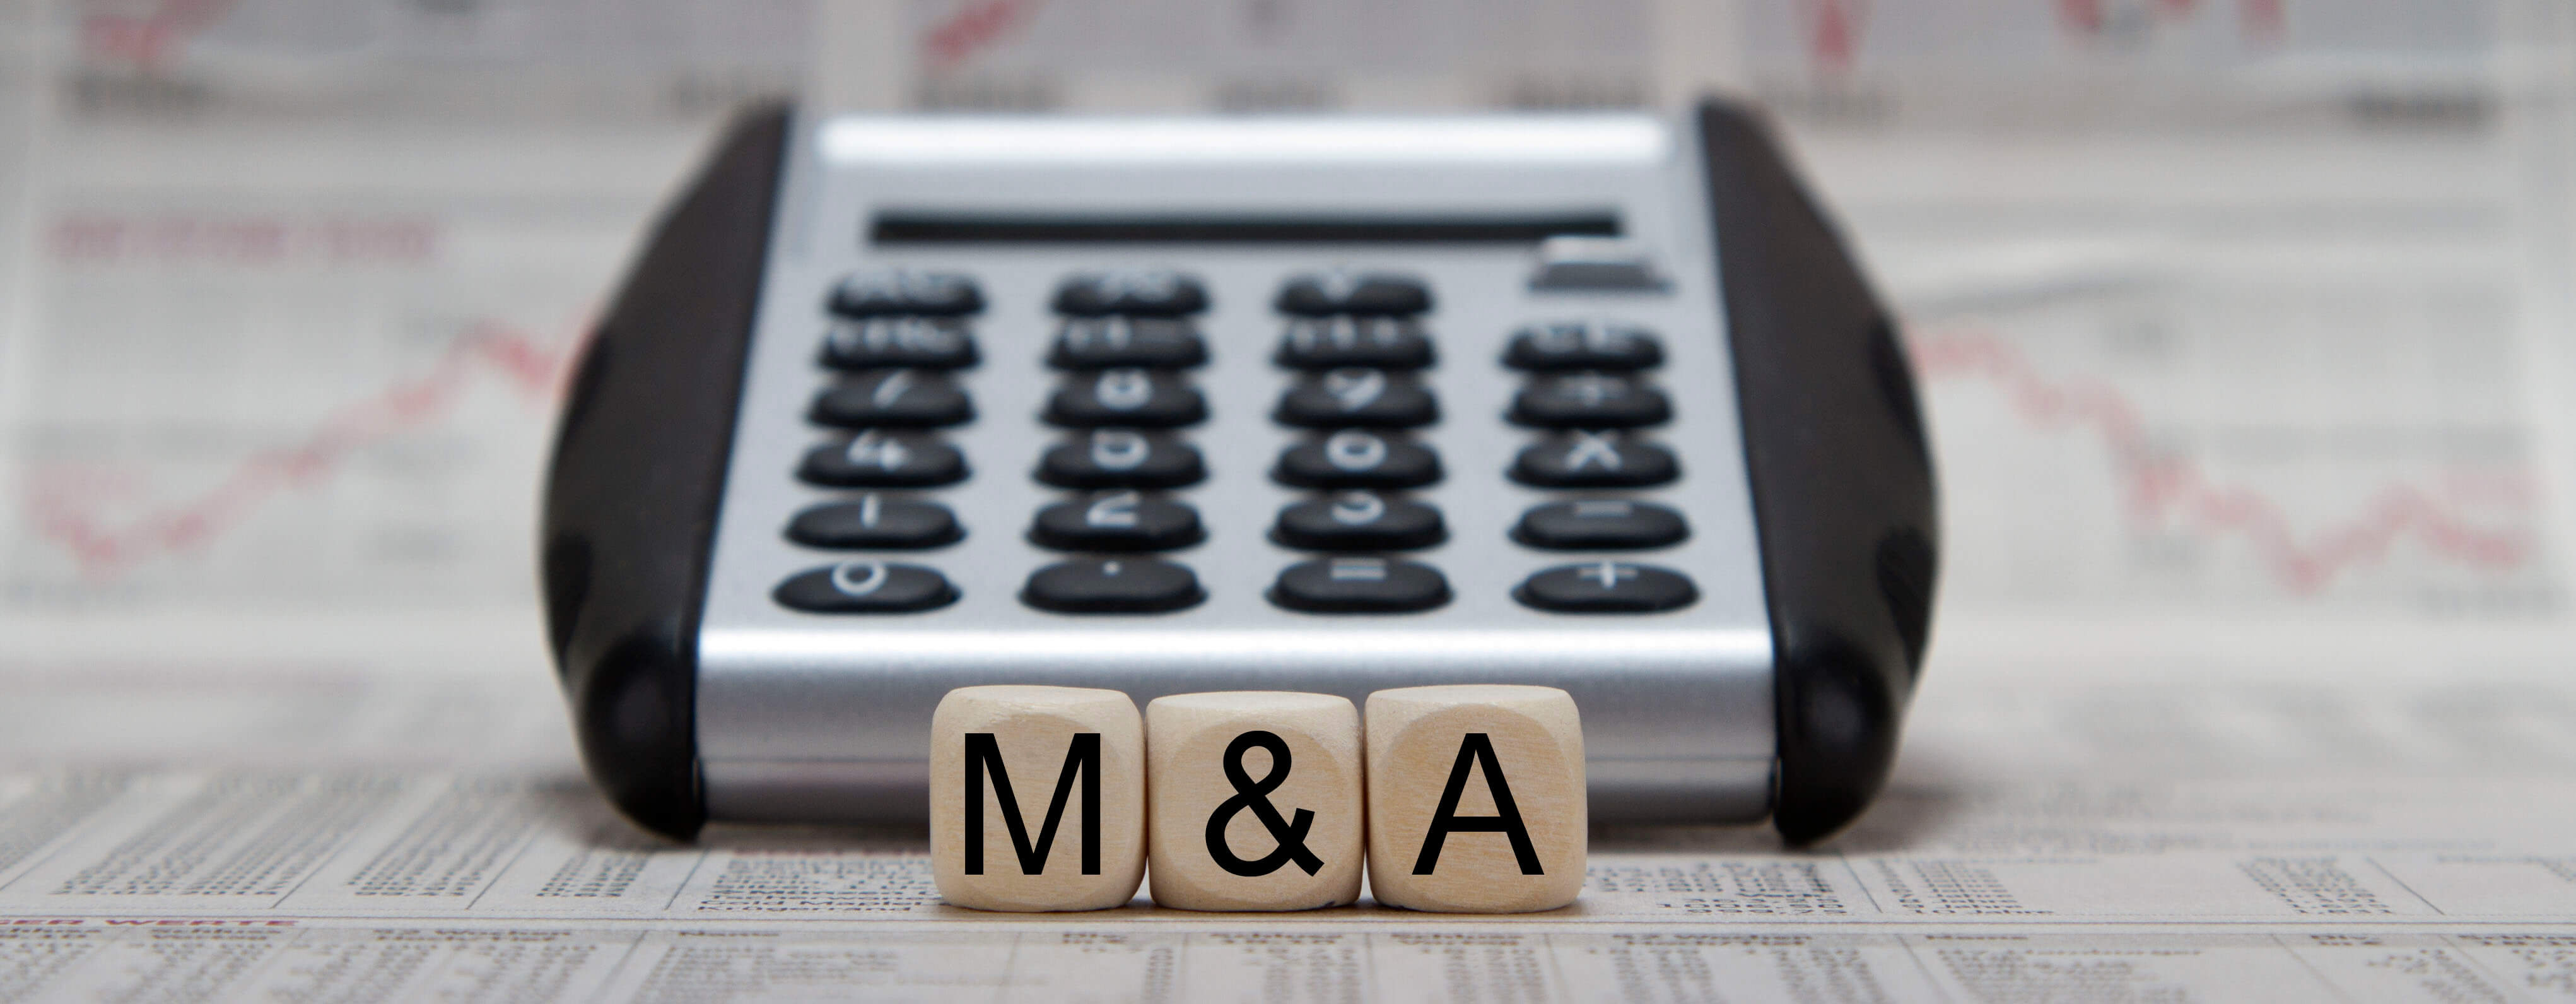 M&A - Mergers and Acquisitions - $5 Million Minimum Deal Size